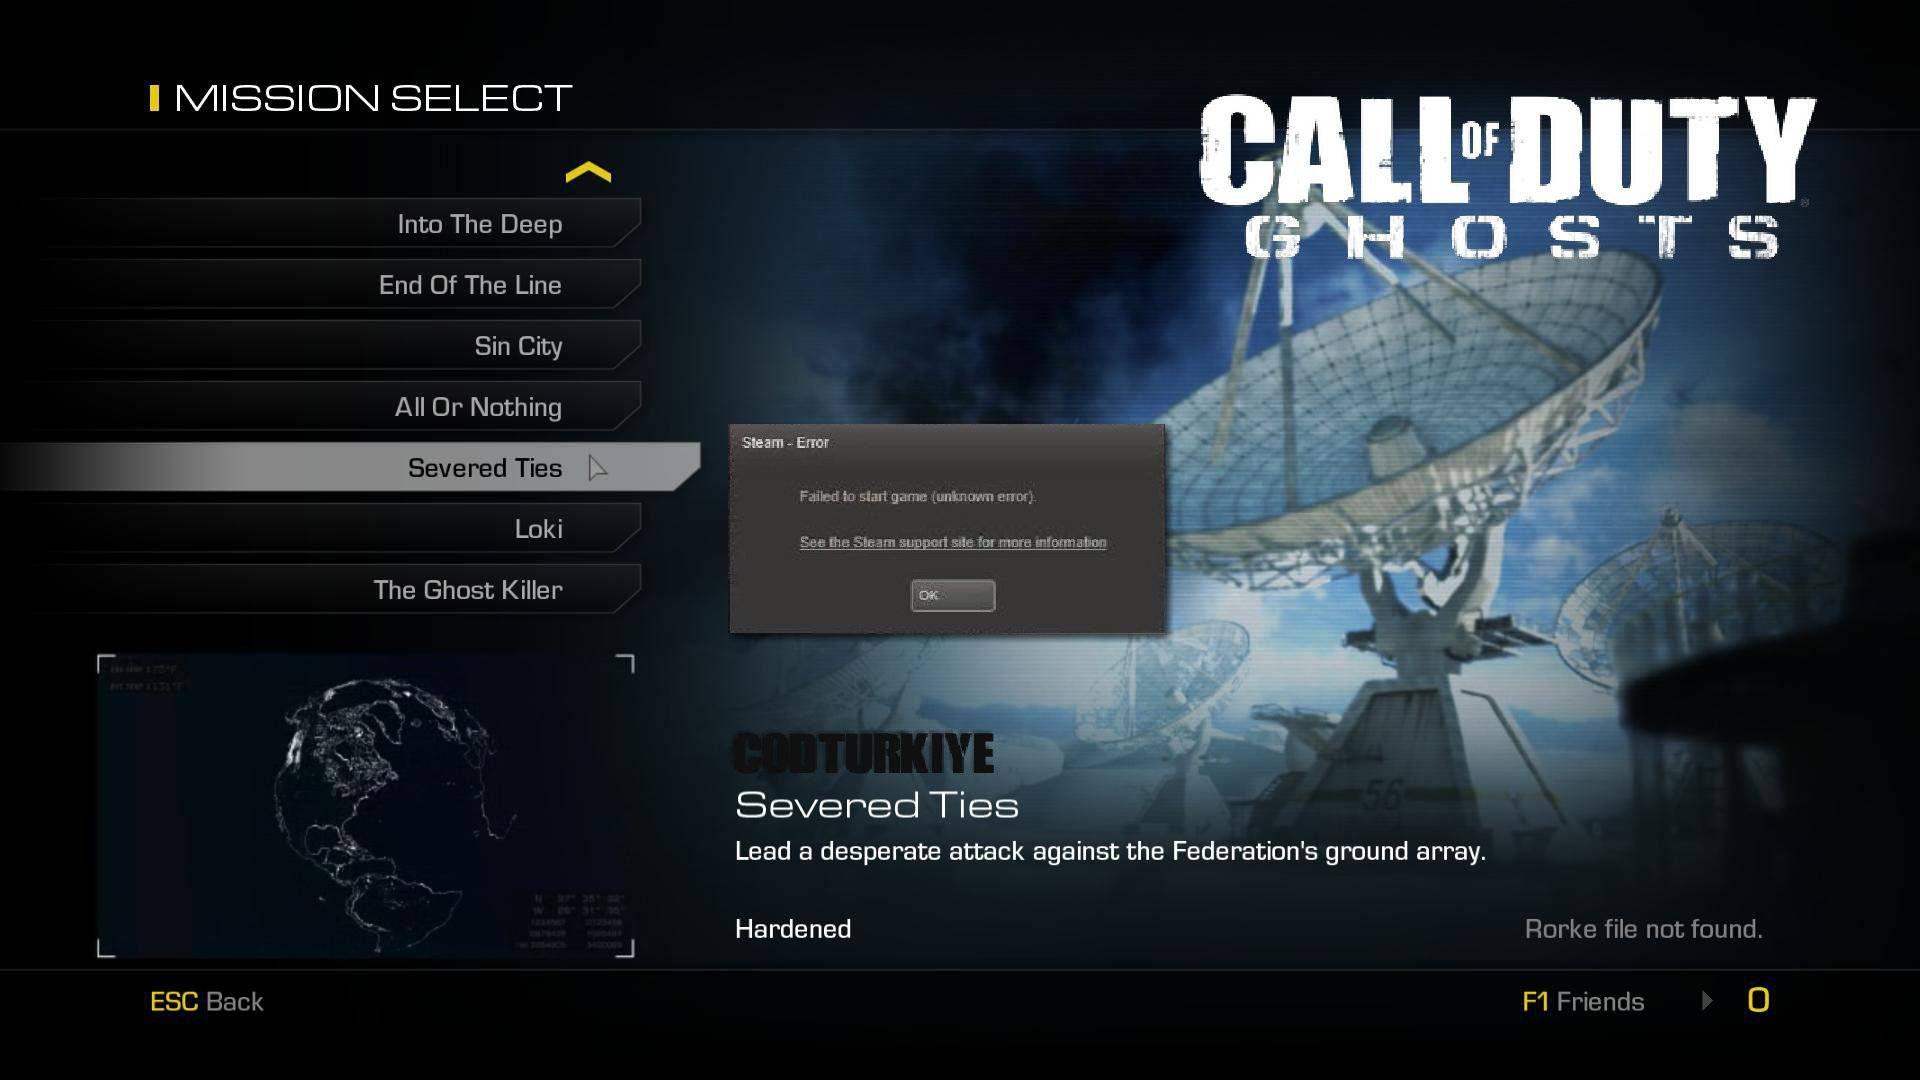 Call of Duty Ghosts Failed to Start Game Unknown Hatası Çözümü